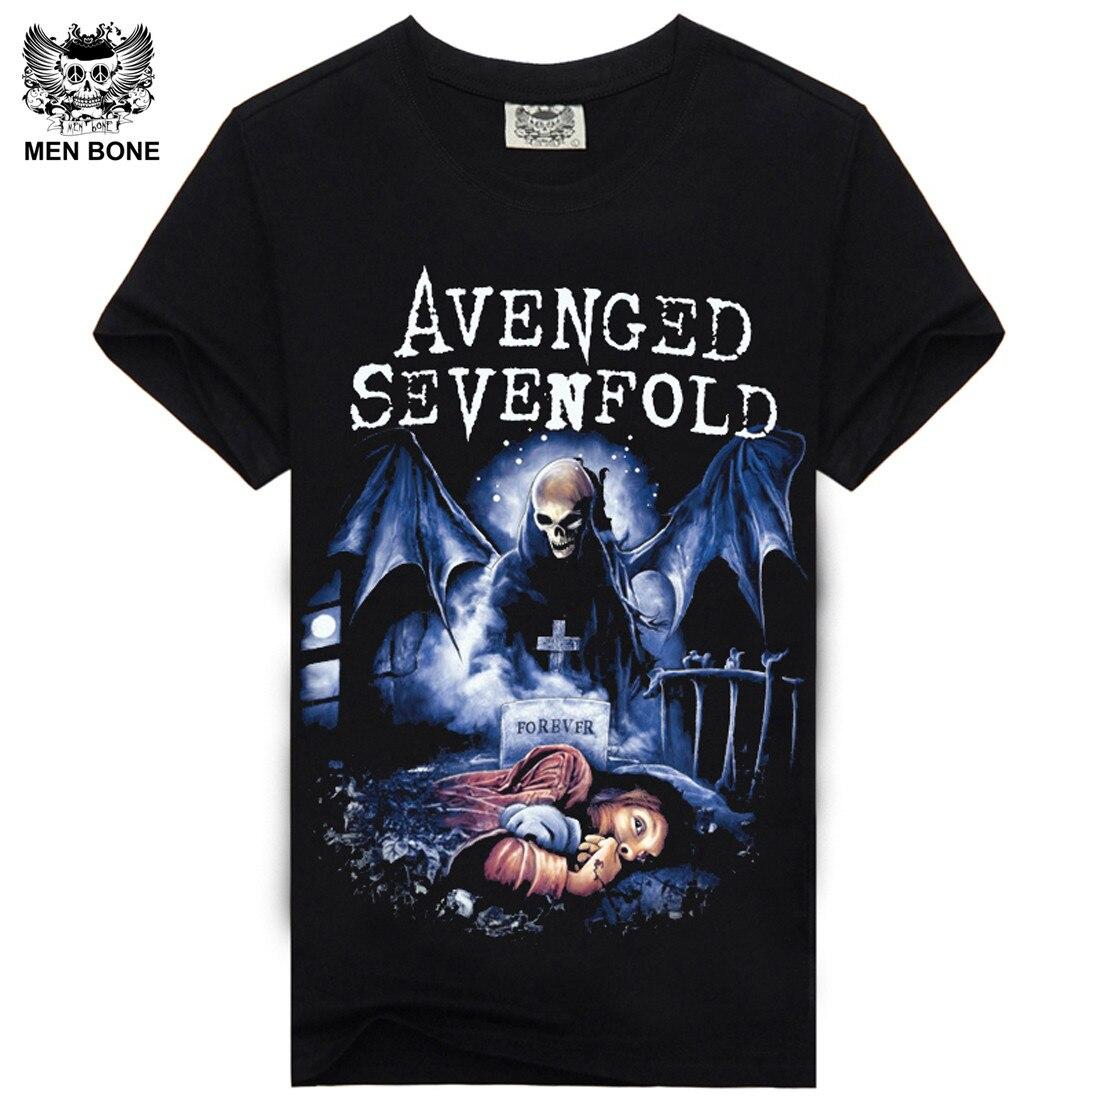 [Men bone] vingado sevenfold heavy metal rock men t shirt impressão t-shirts de manga curta o pescoço hiphop casual camiseta